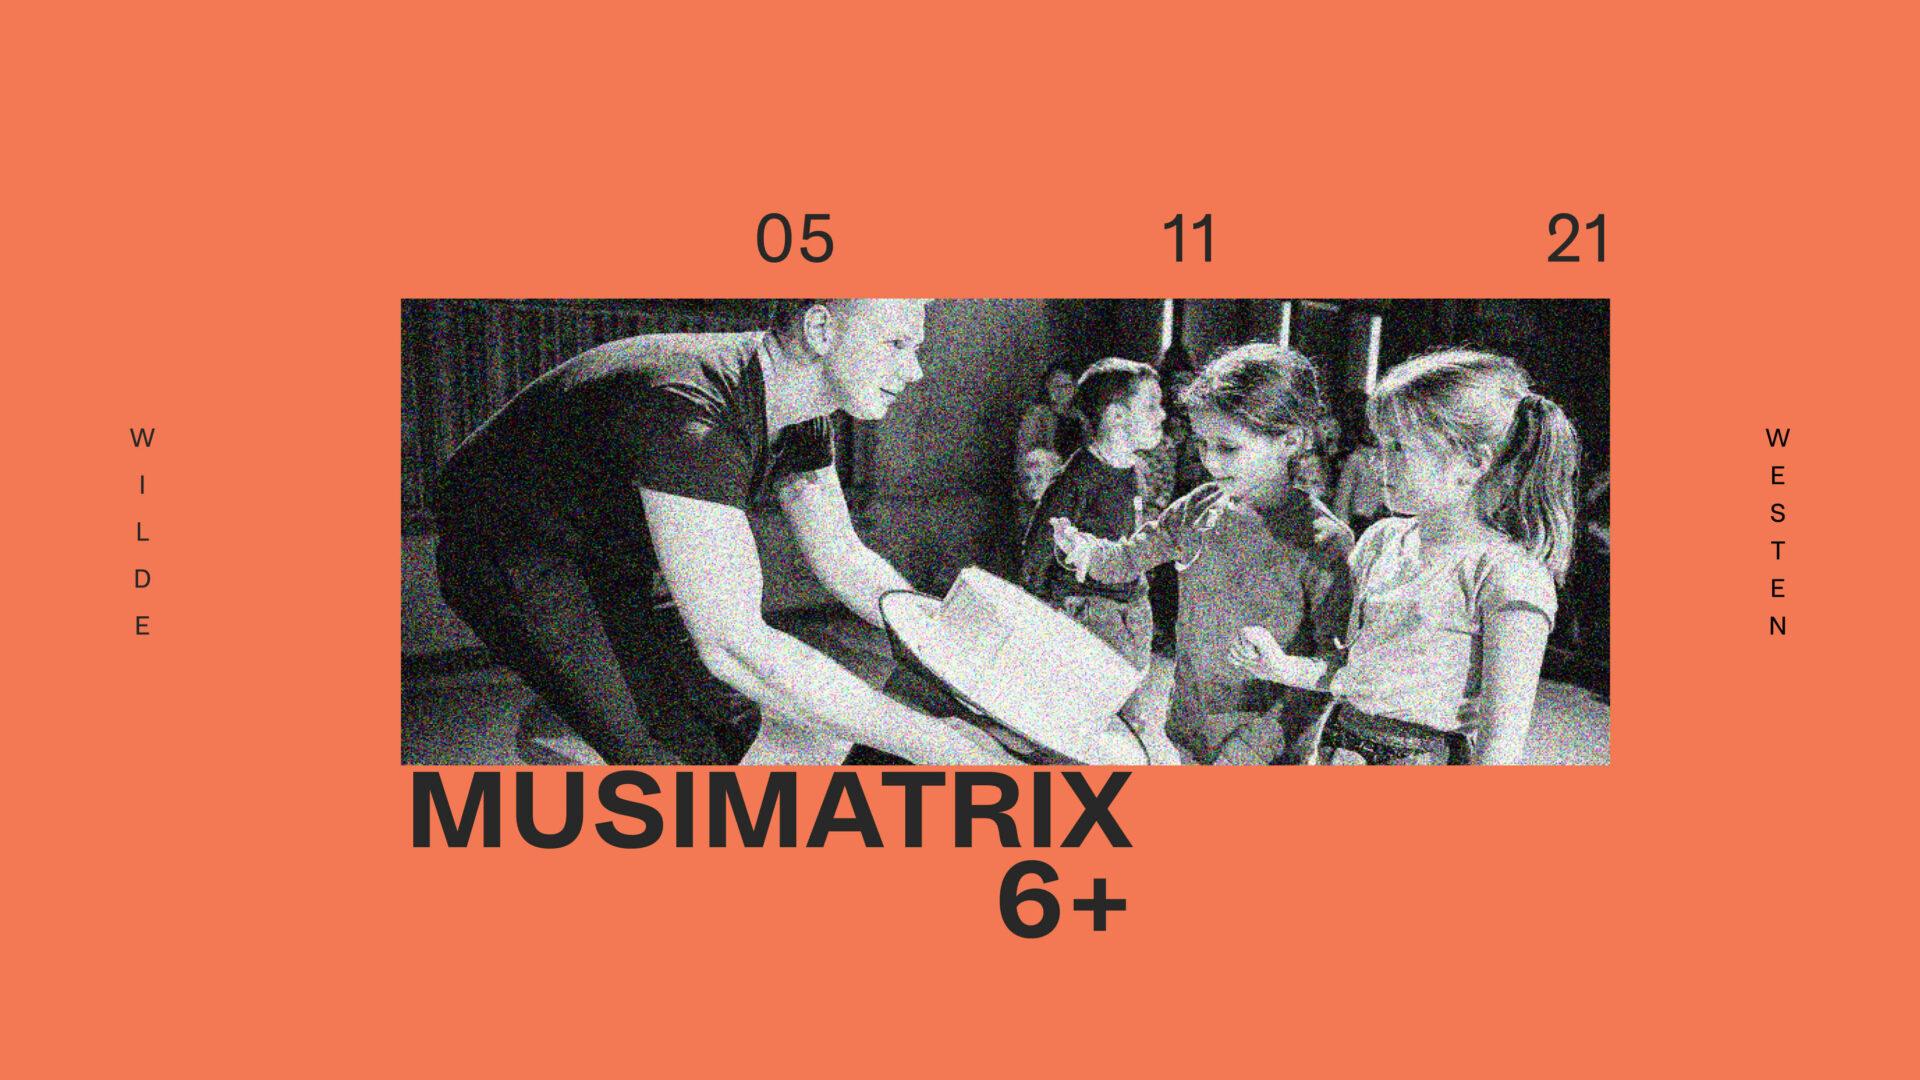 Musimatrix musical duo interactive sound experience